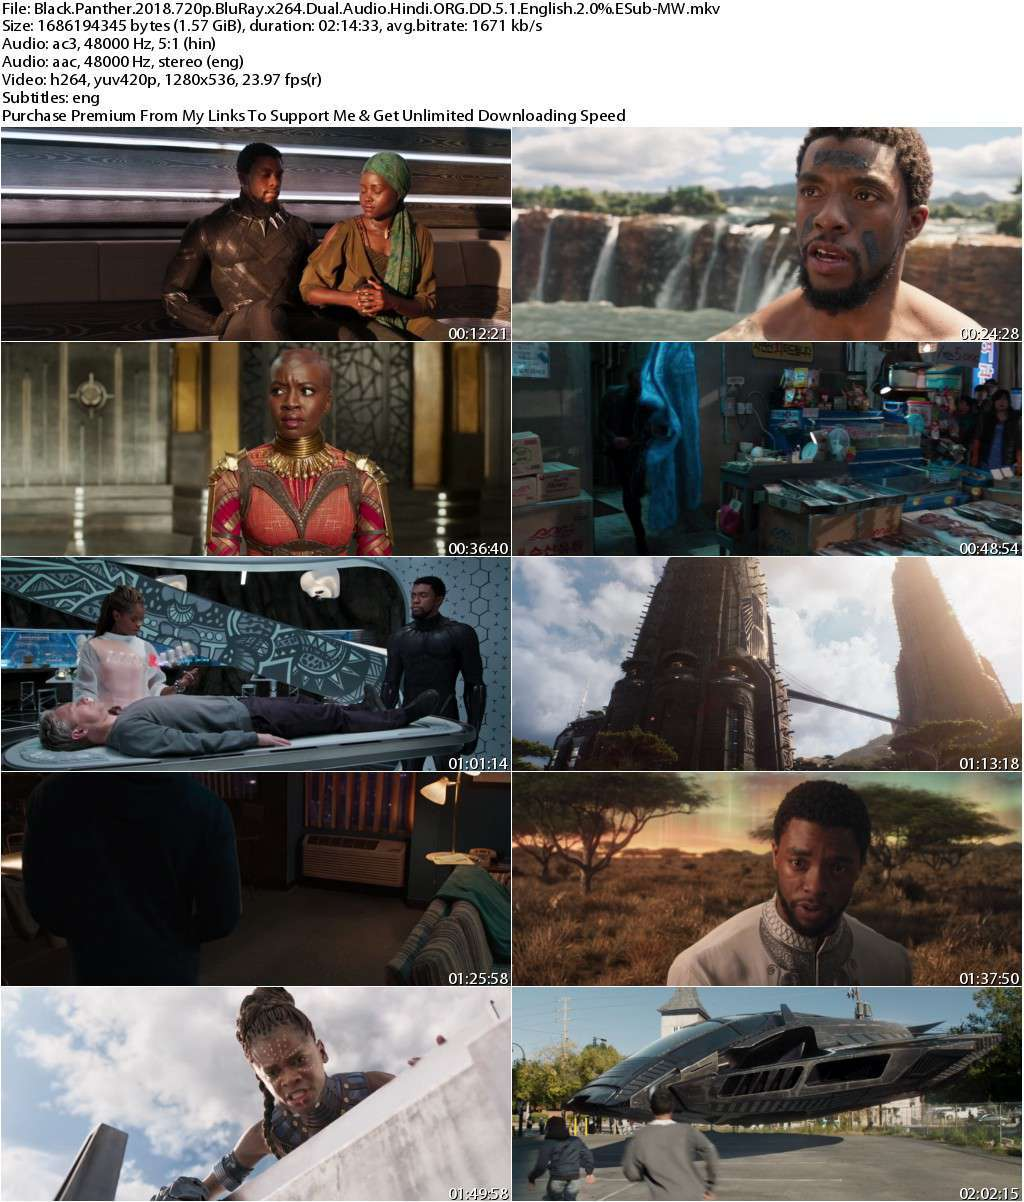 Black Panther (2018) 720p BluRay Dual Audio [Hindi ORG DD.5.1+English] ESub-MW